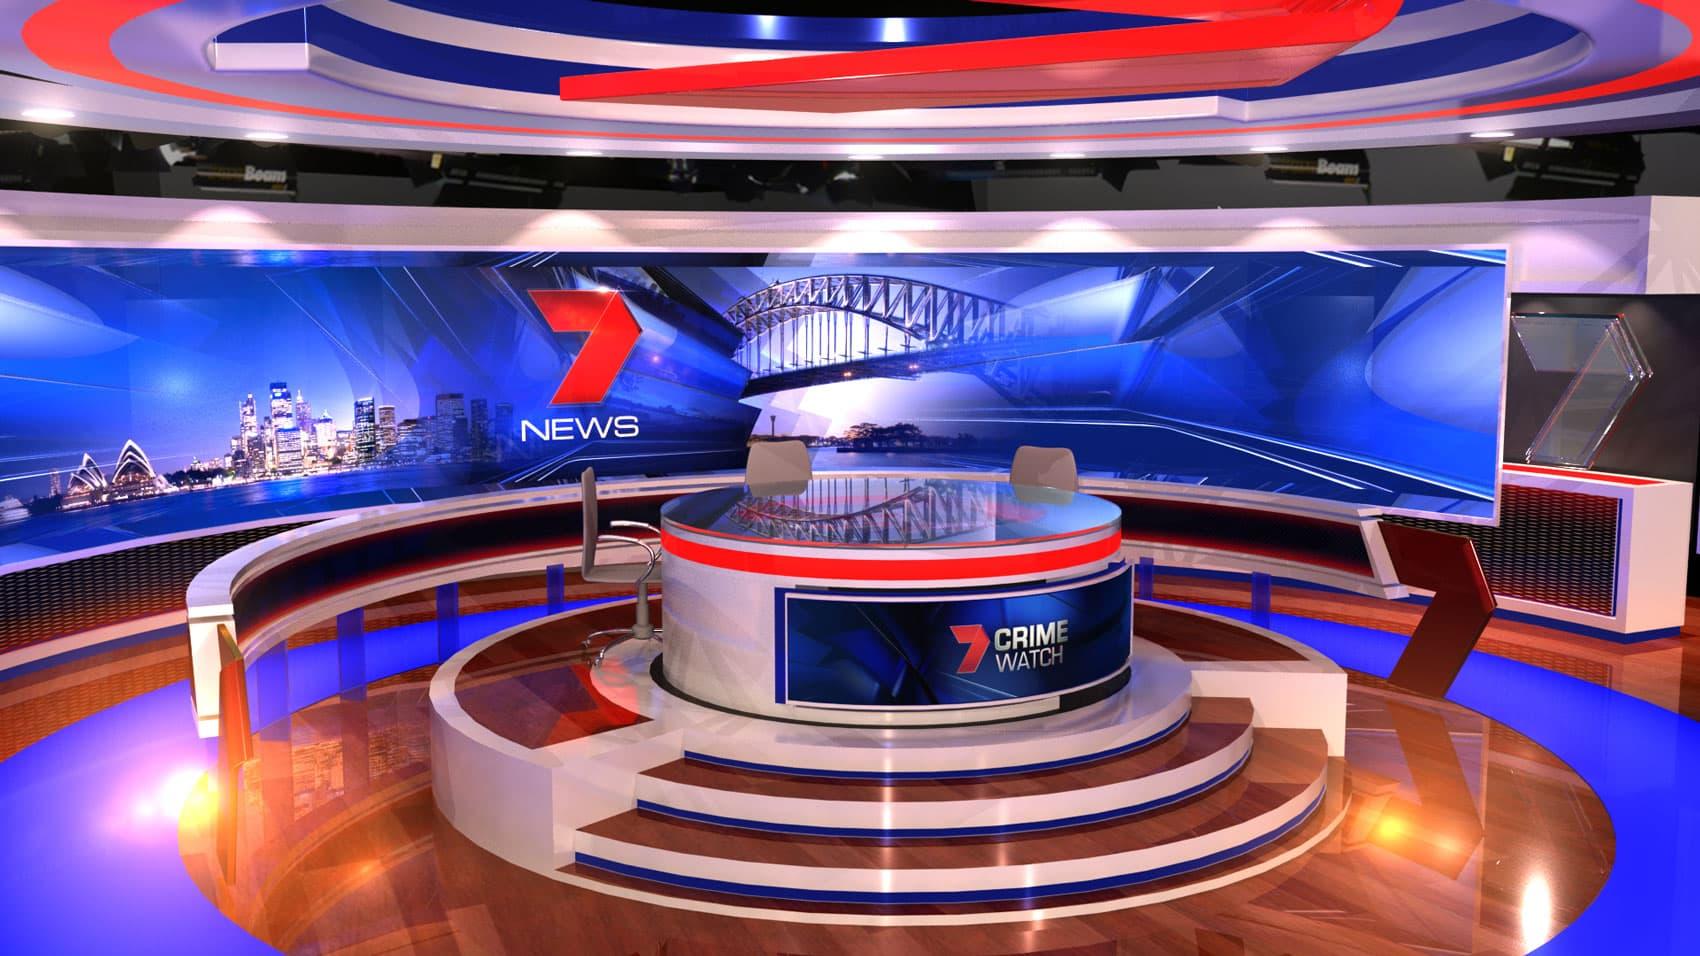 2016 Seven News Set Design 07 Girraphic